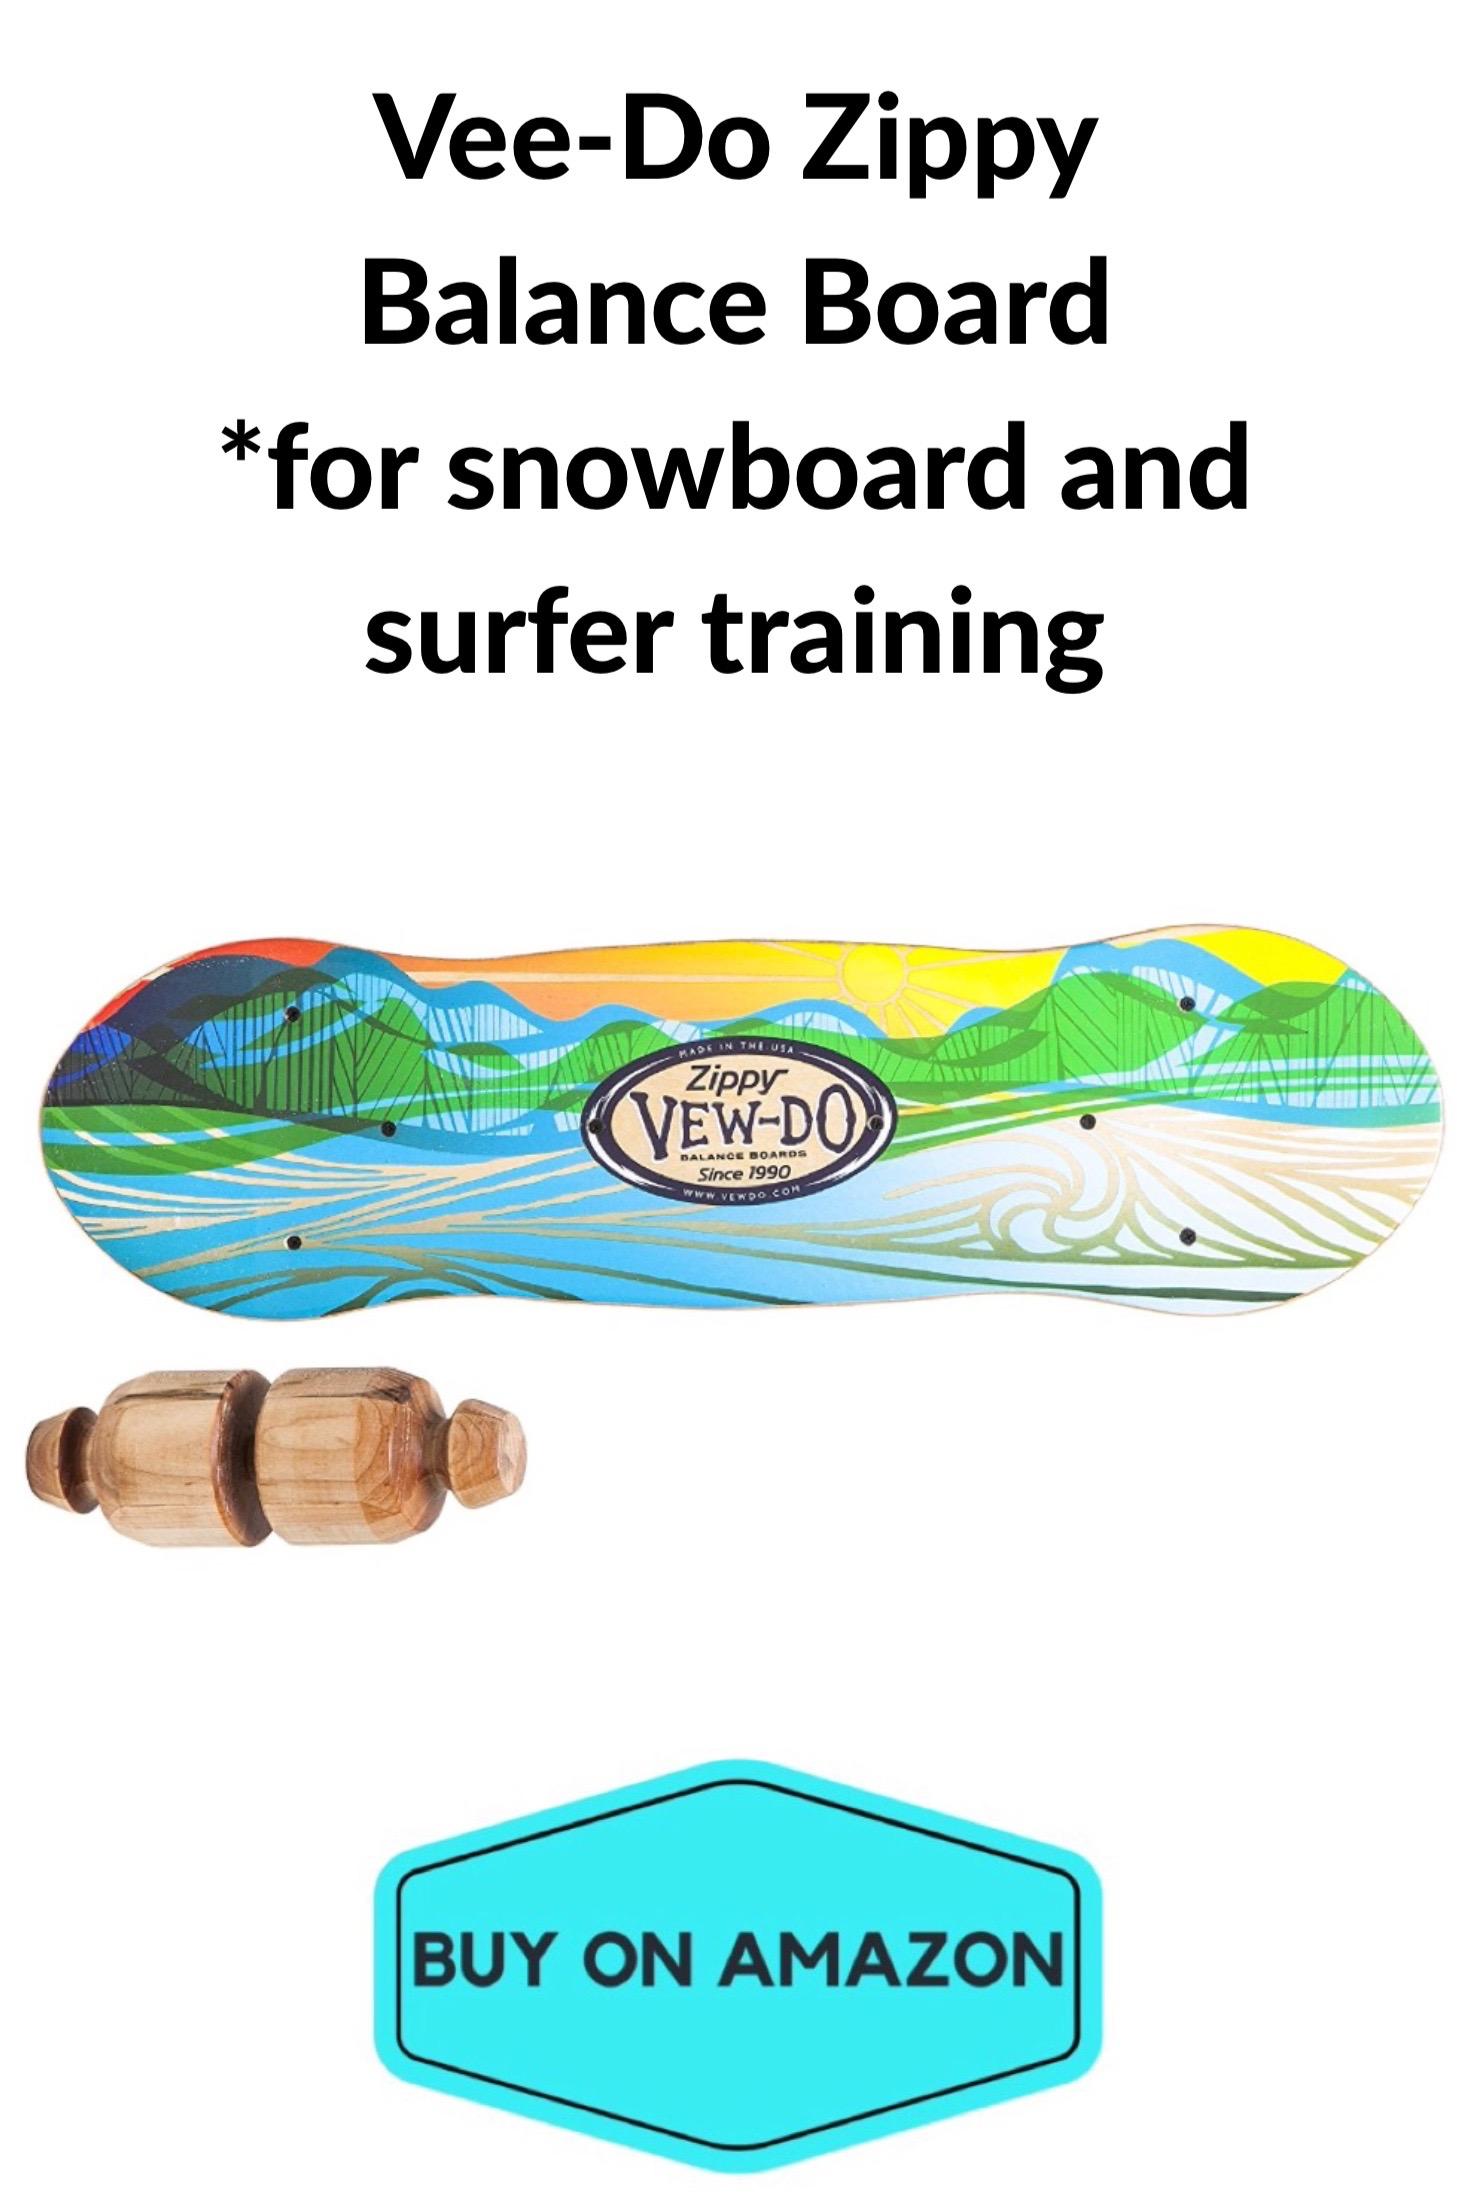 Vee-Do Zippy Balance Board